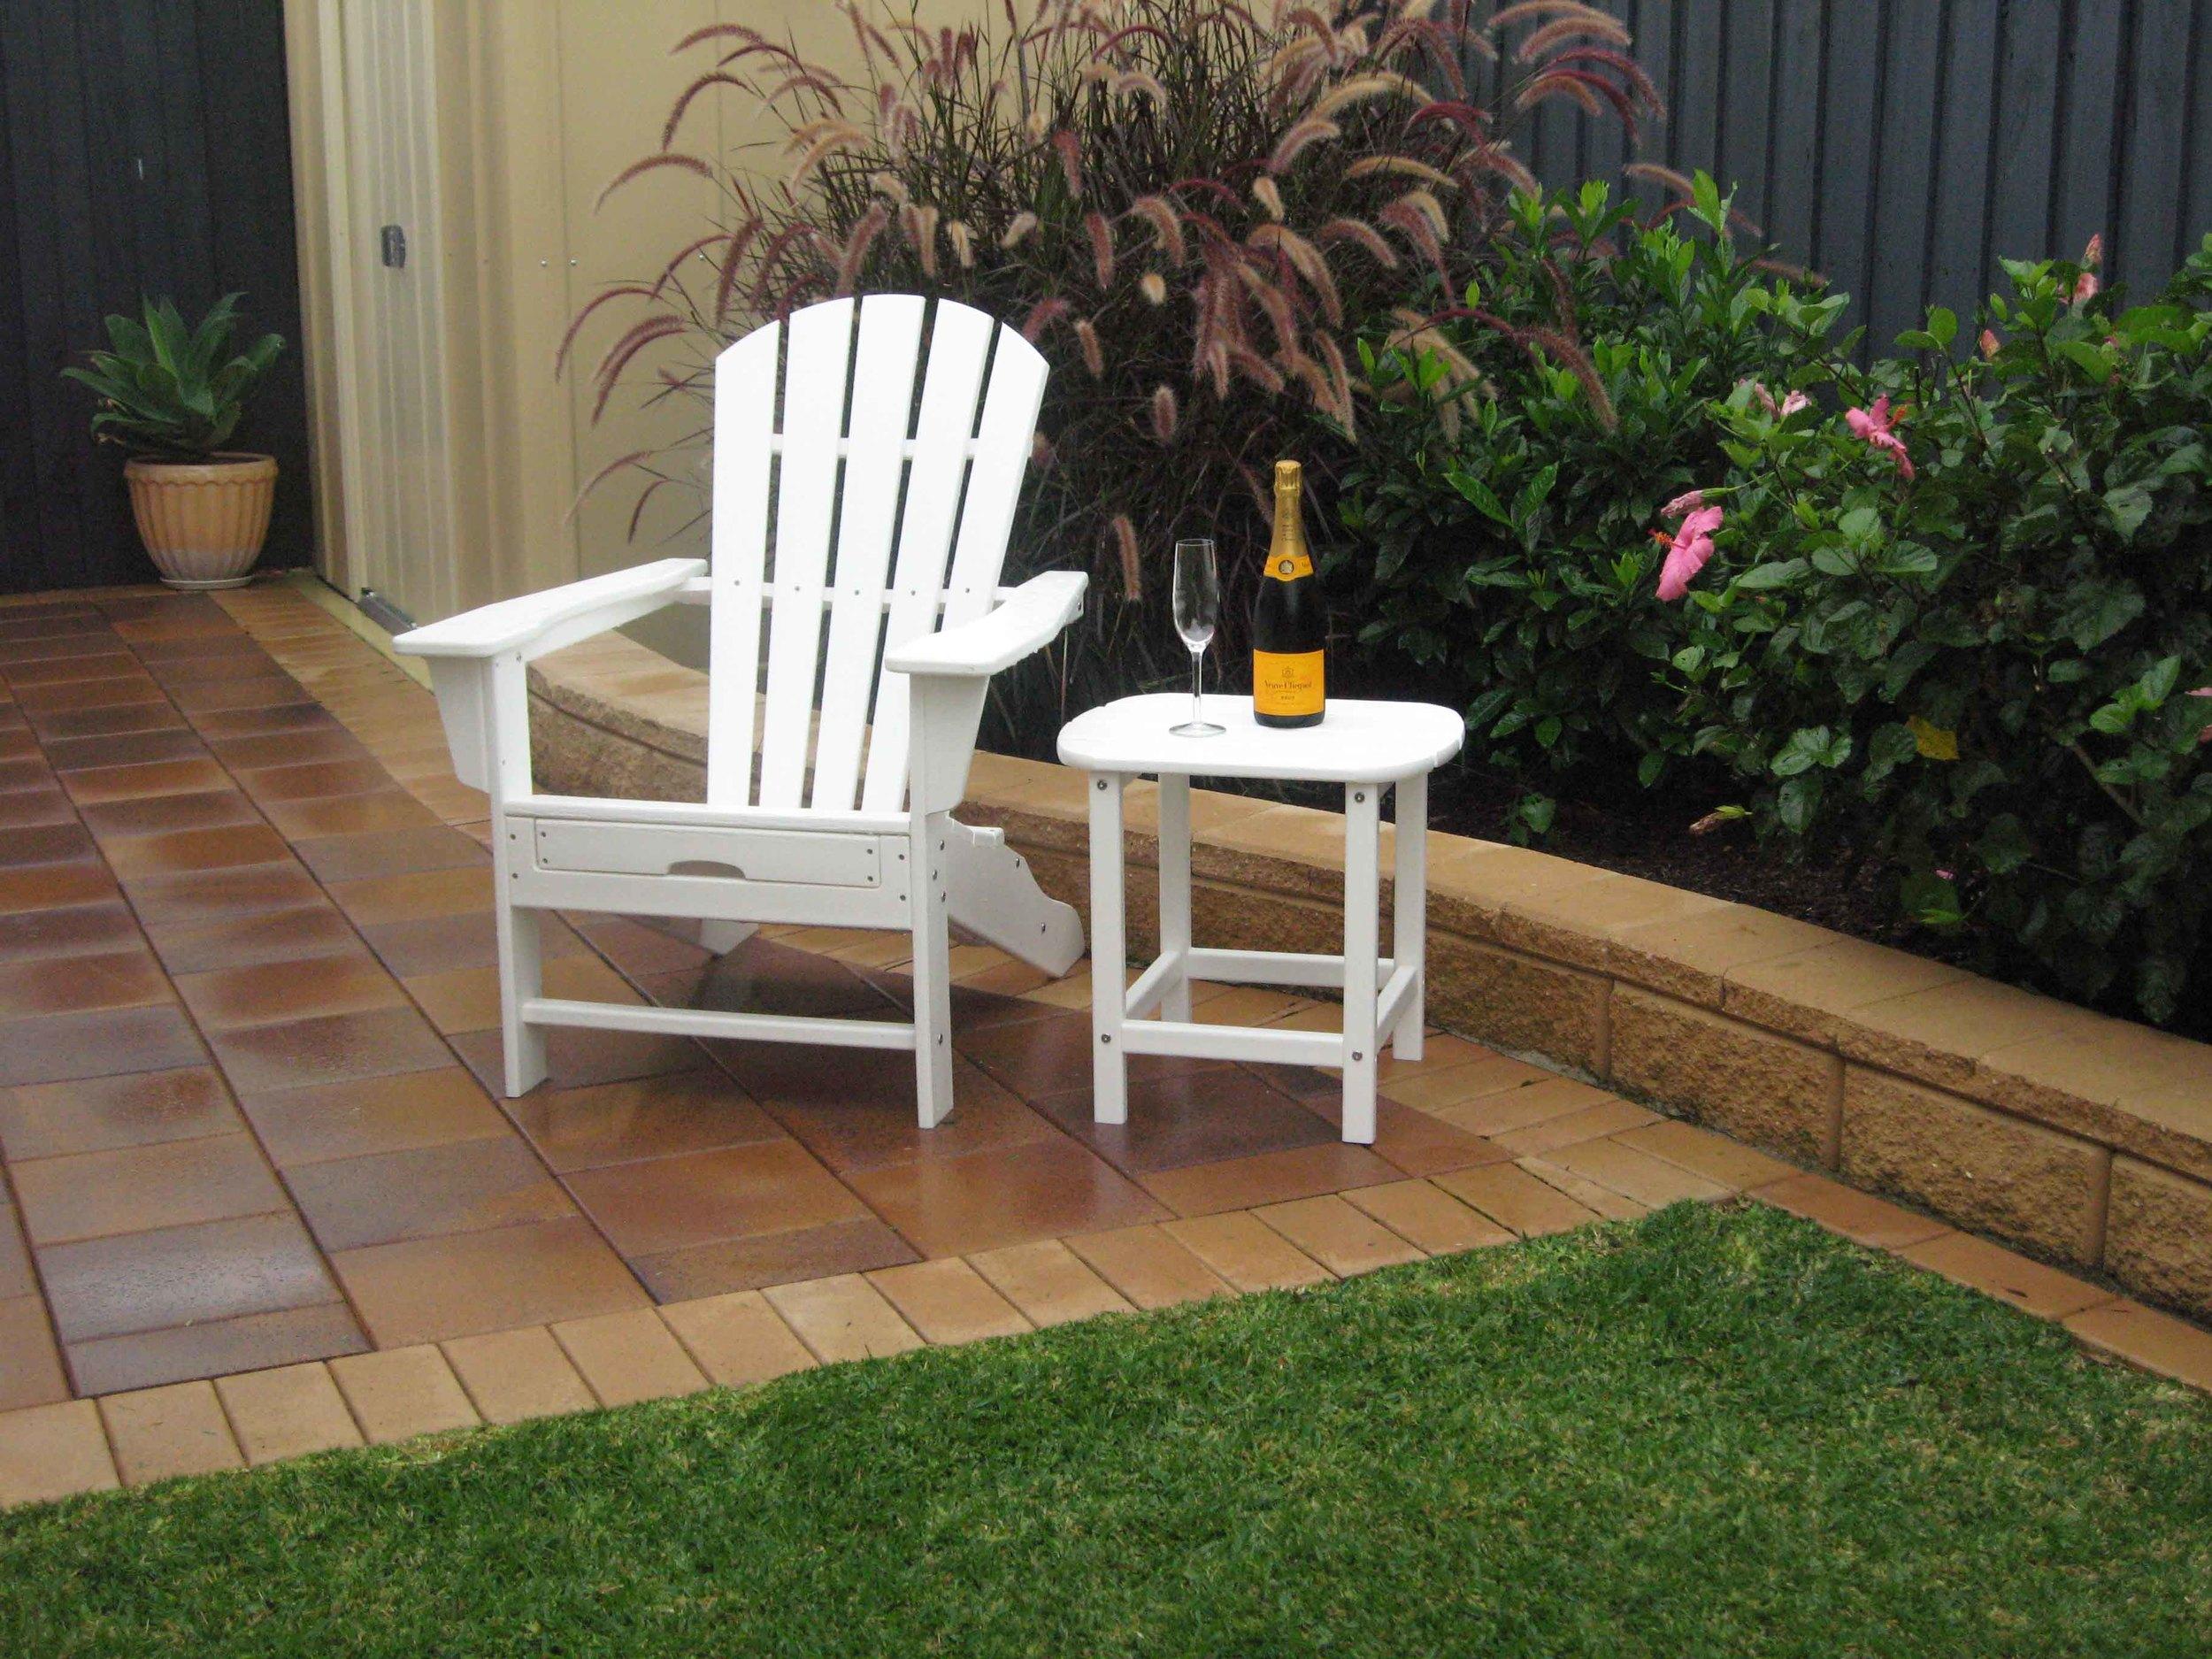 South Beach chair & side table.jpg